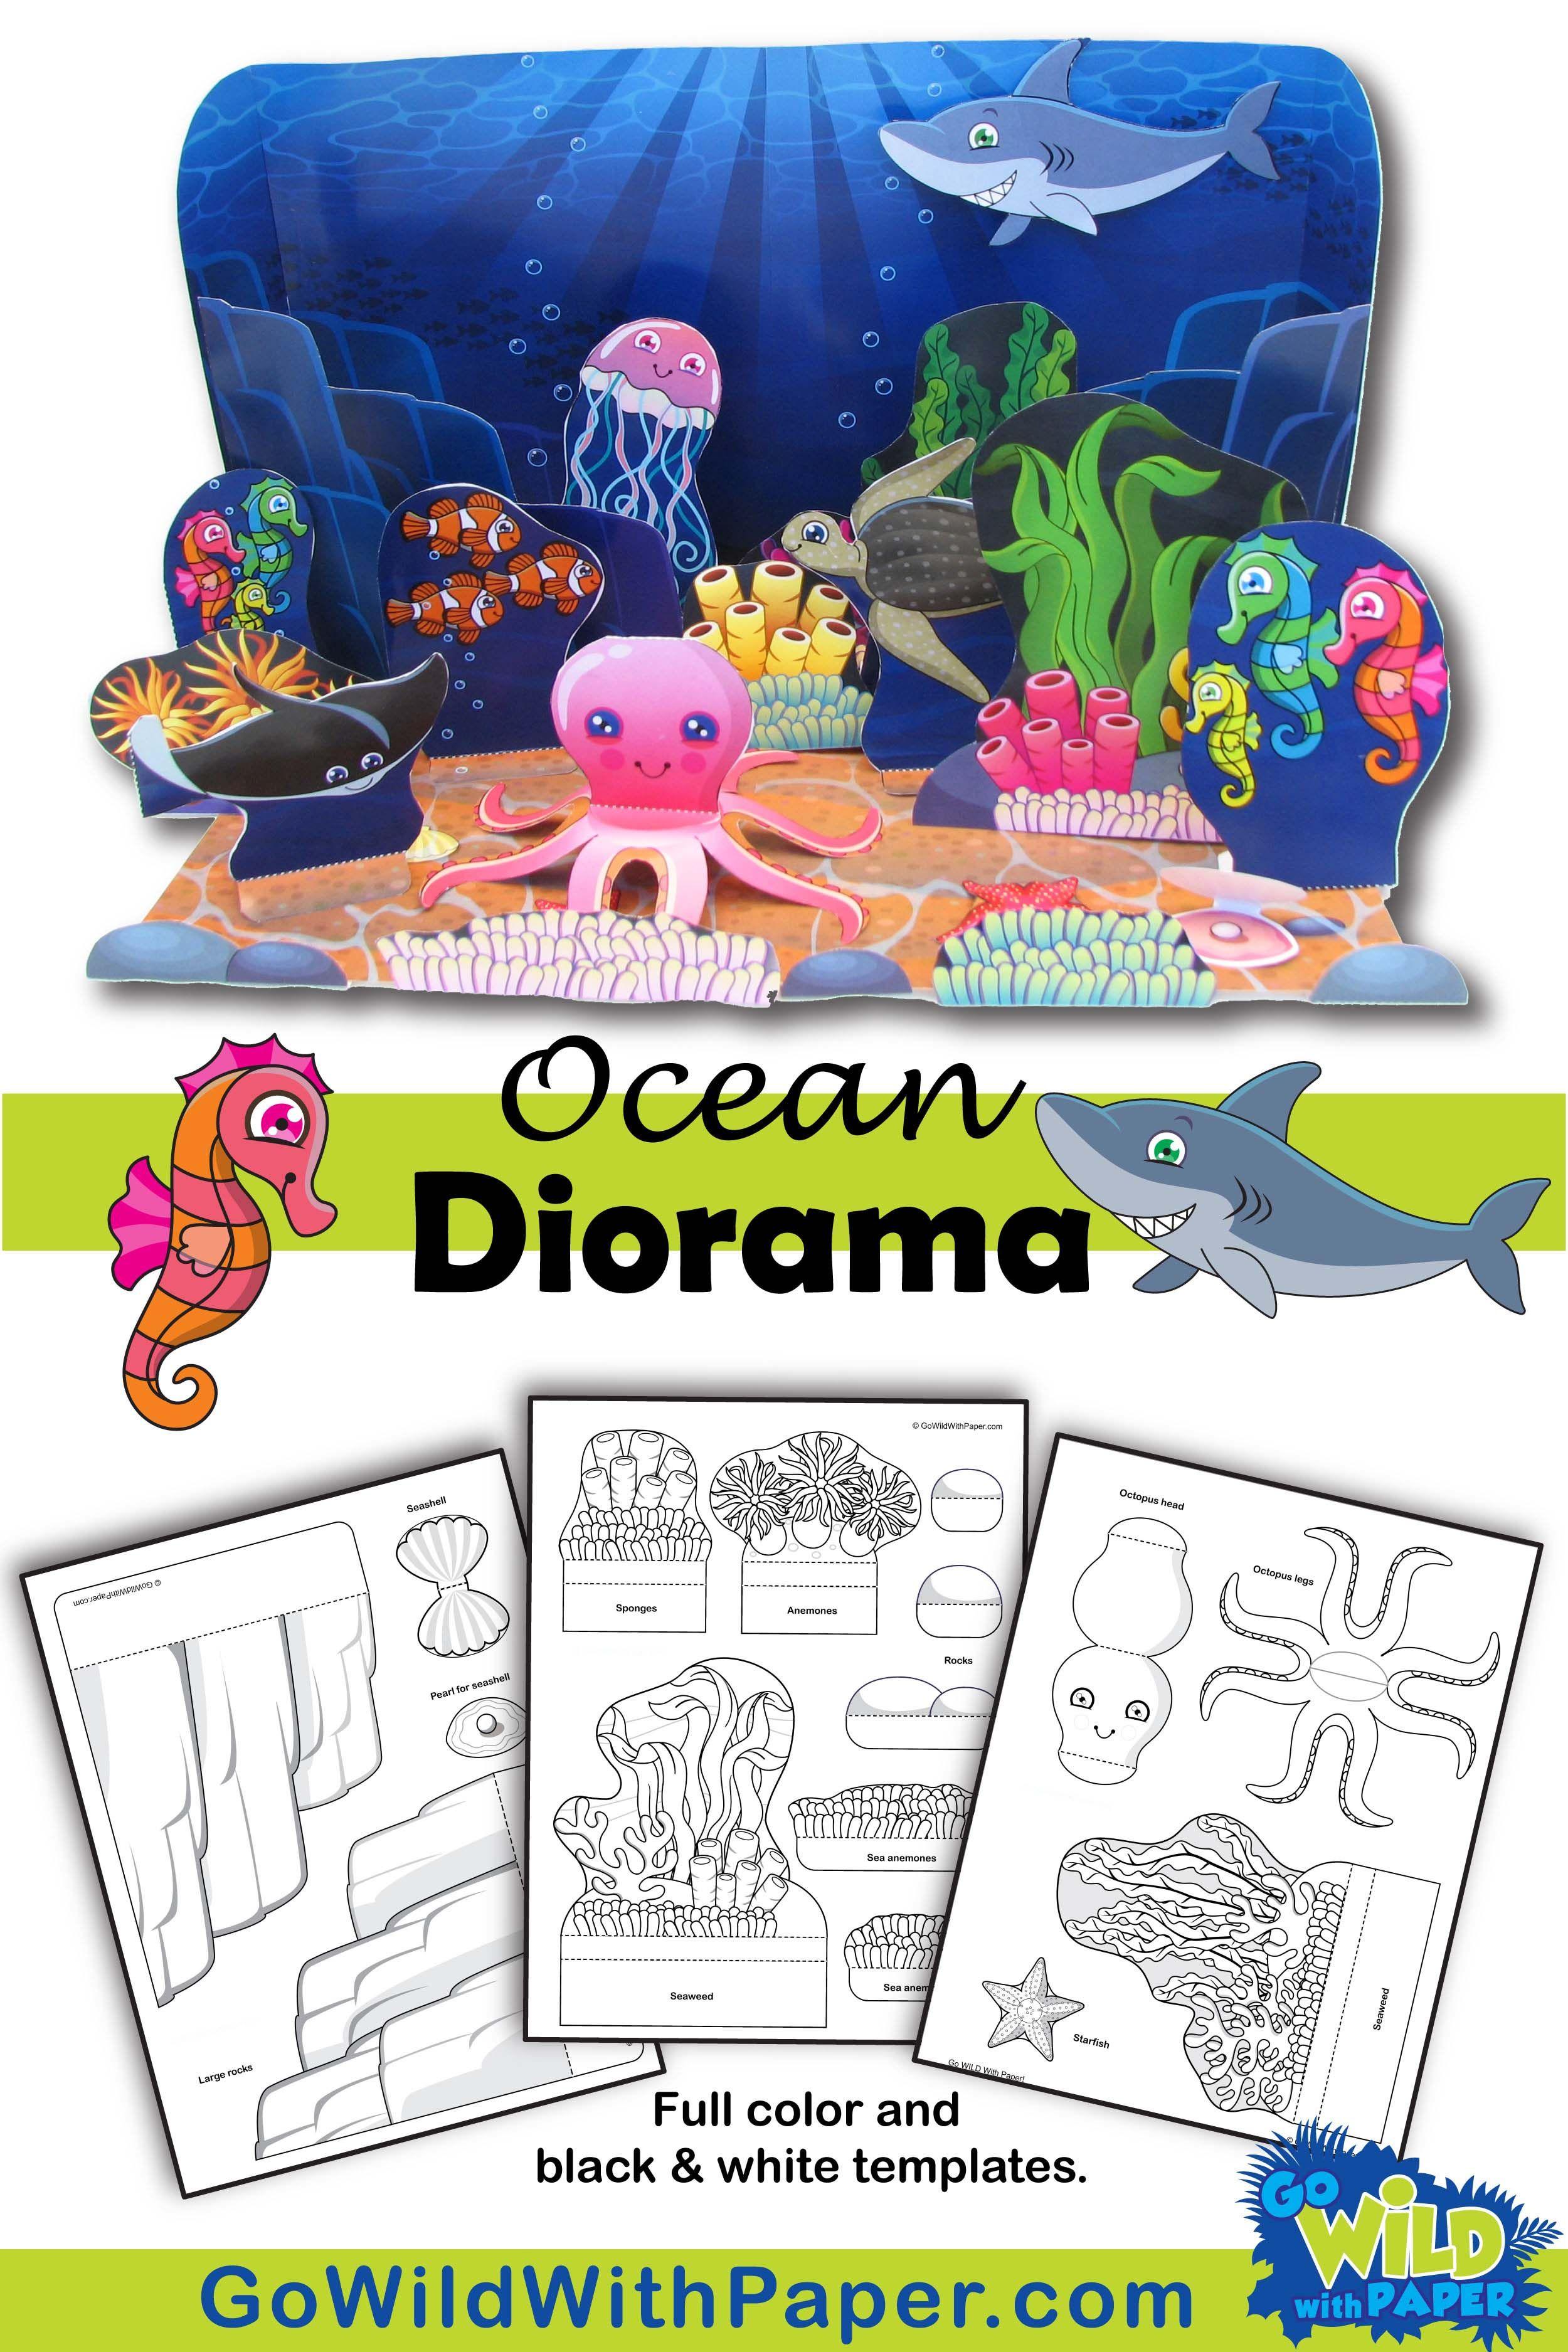 Ocean Diorama Project - Animal Habitat Activity